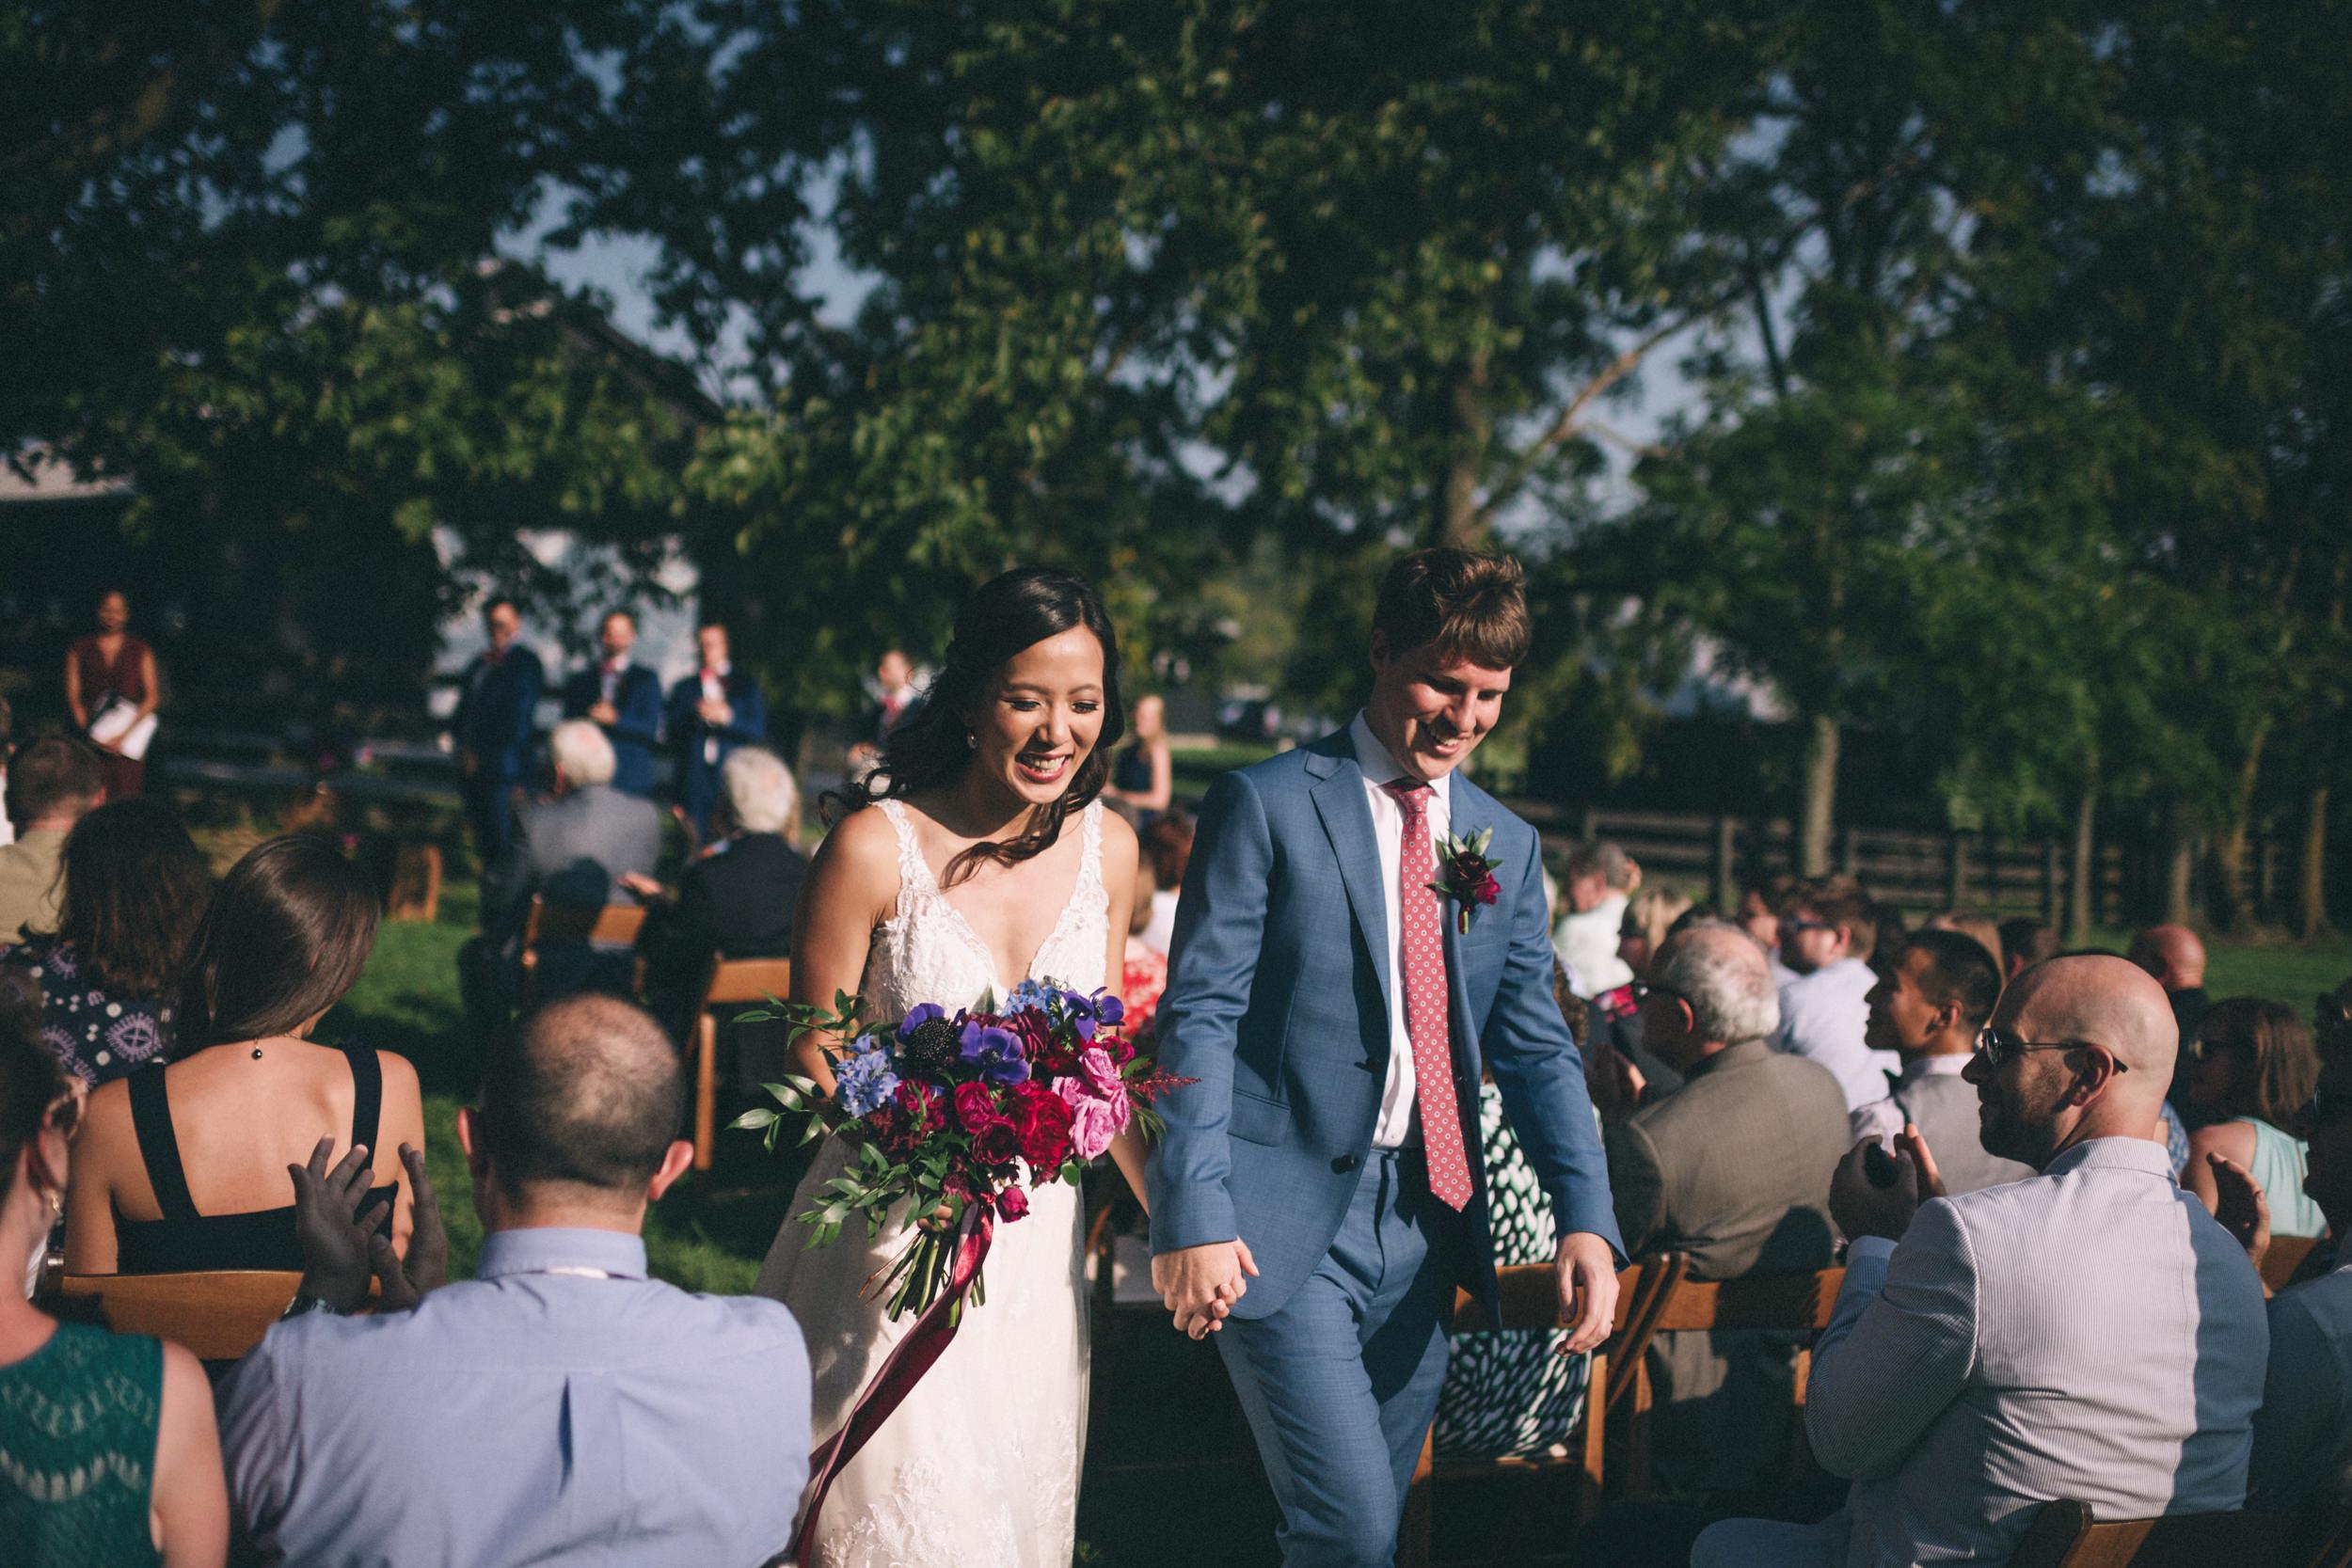 Louisville-Kentucky-Wedding-and-Elopement-Photographer-Sarah-Katherine-Davis-Photography-Summer-Jewel-Toned-Wedding-Chineese-Tea-Ceremony-Warrenwood-Manor-Danville-600.jpg